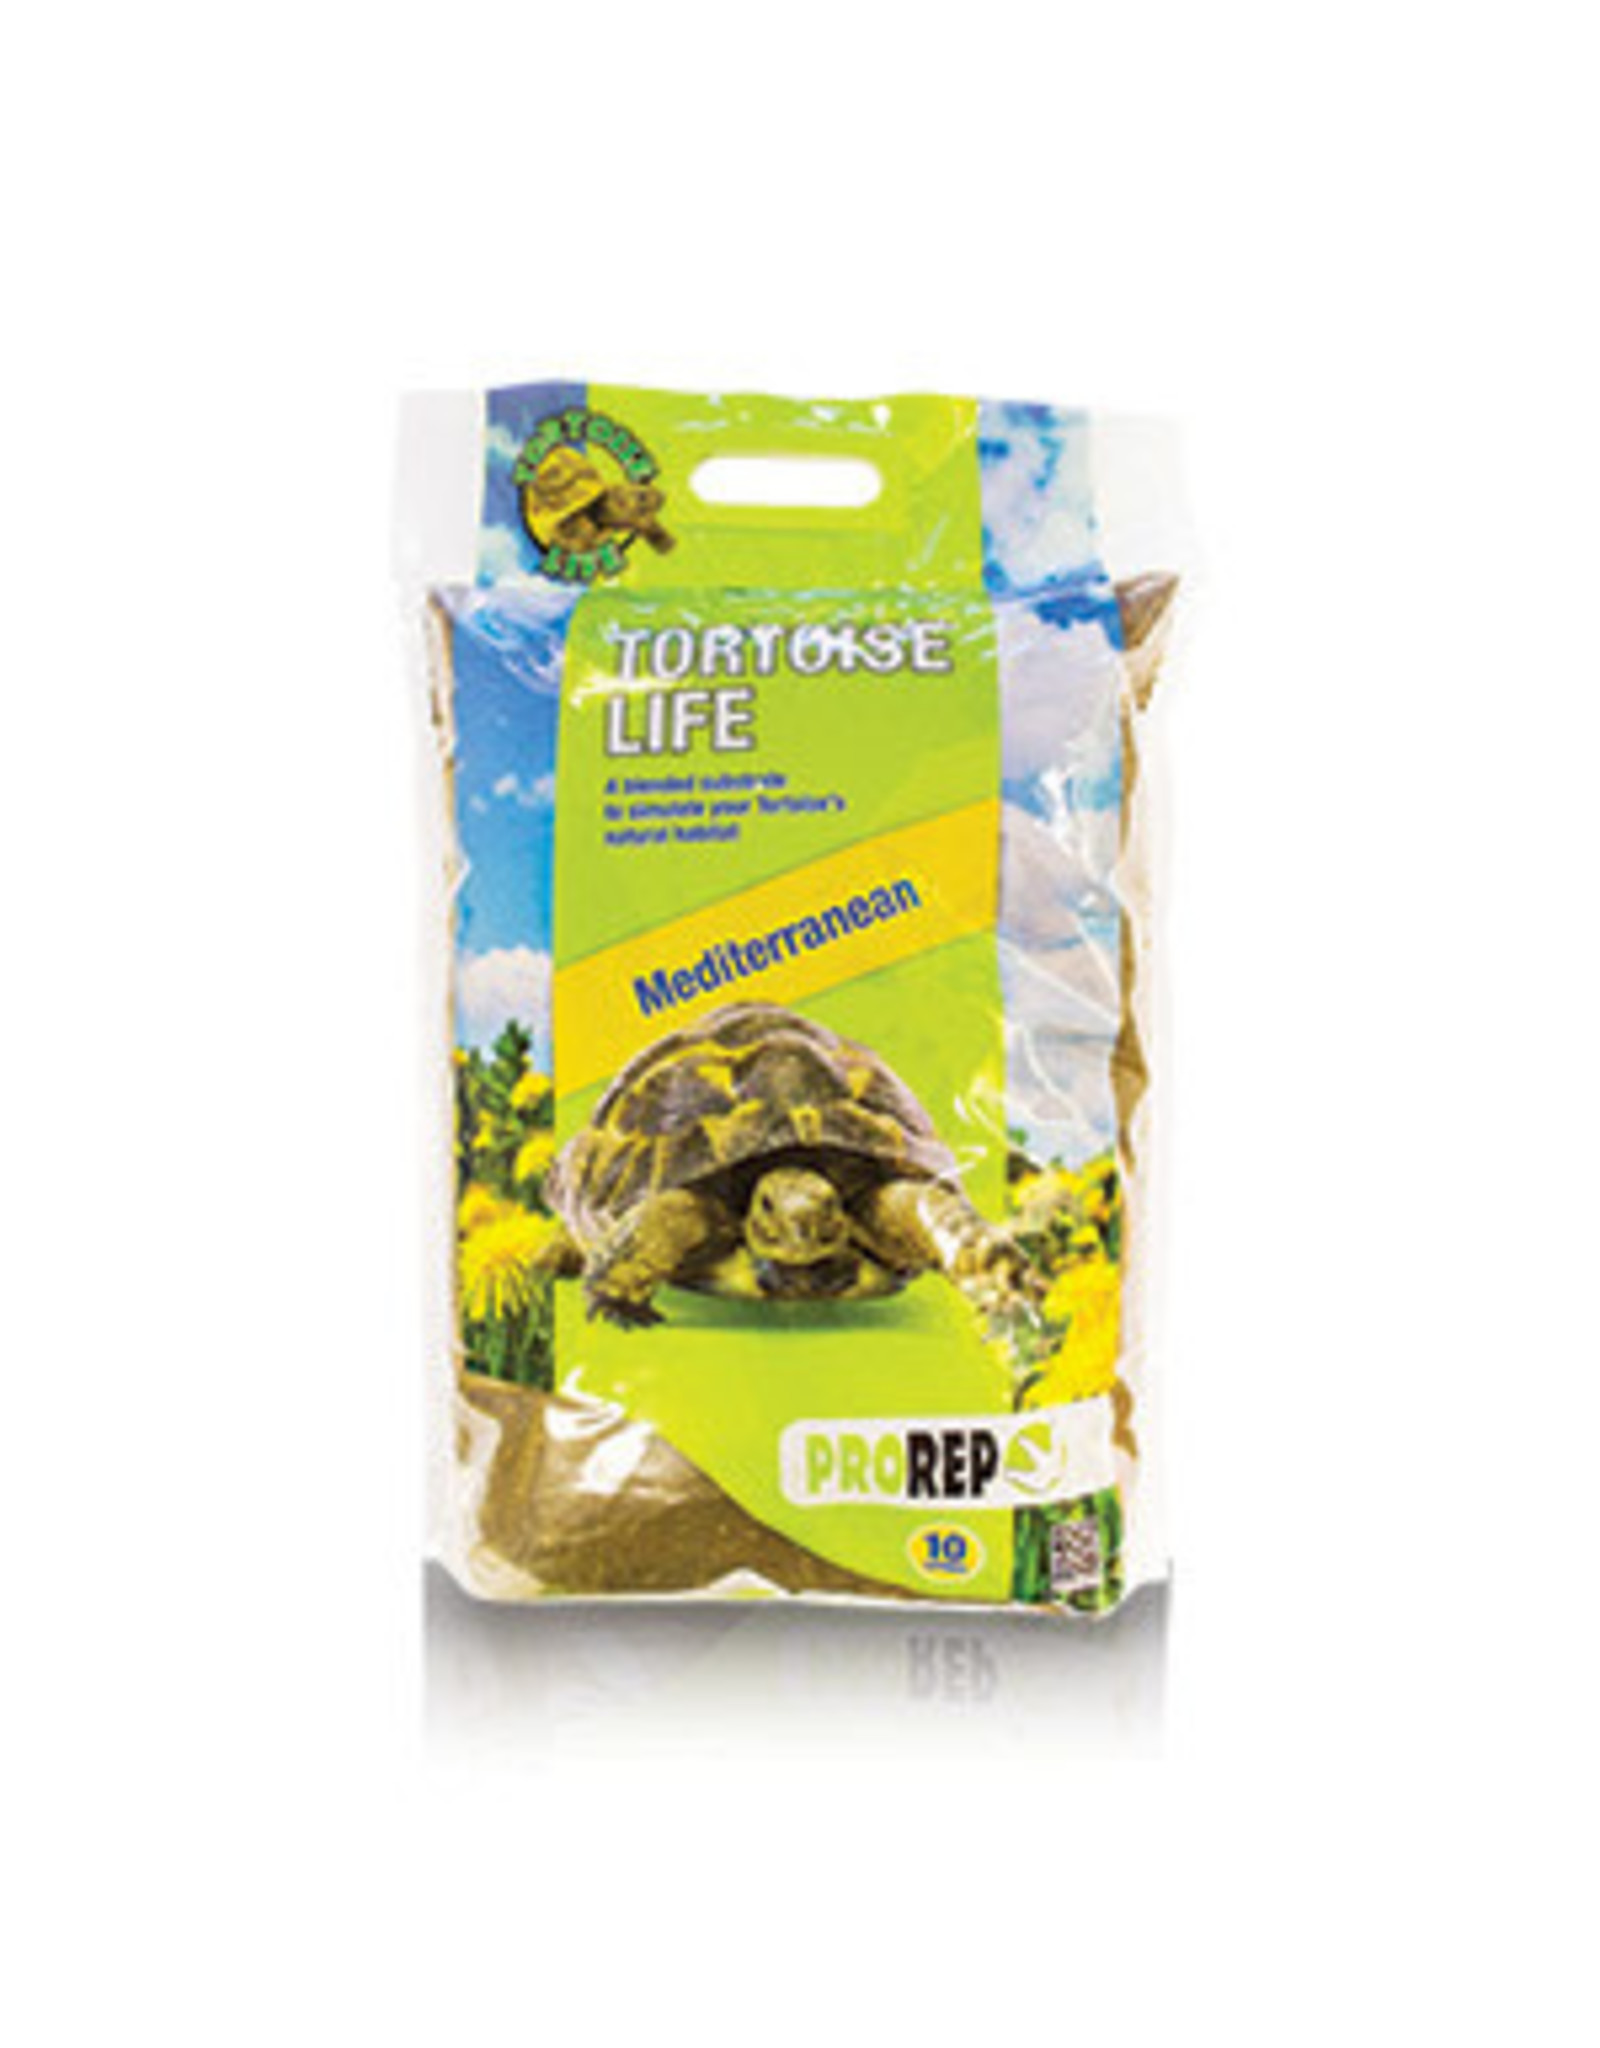 Pro Rep PR Tortoise Life